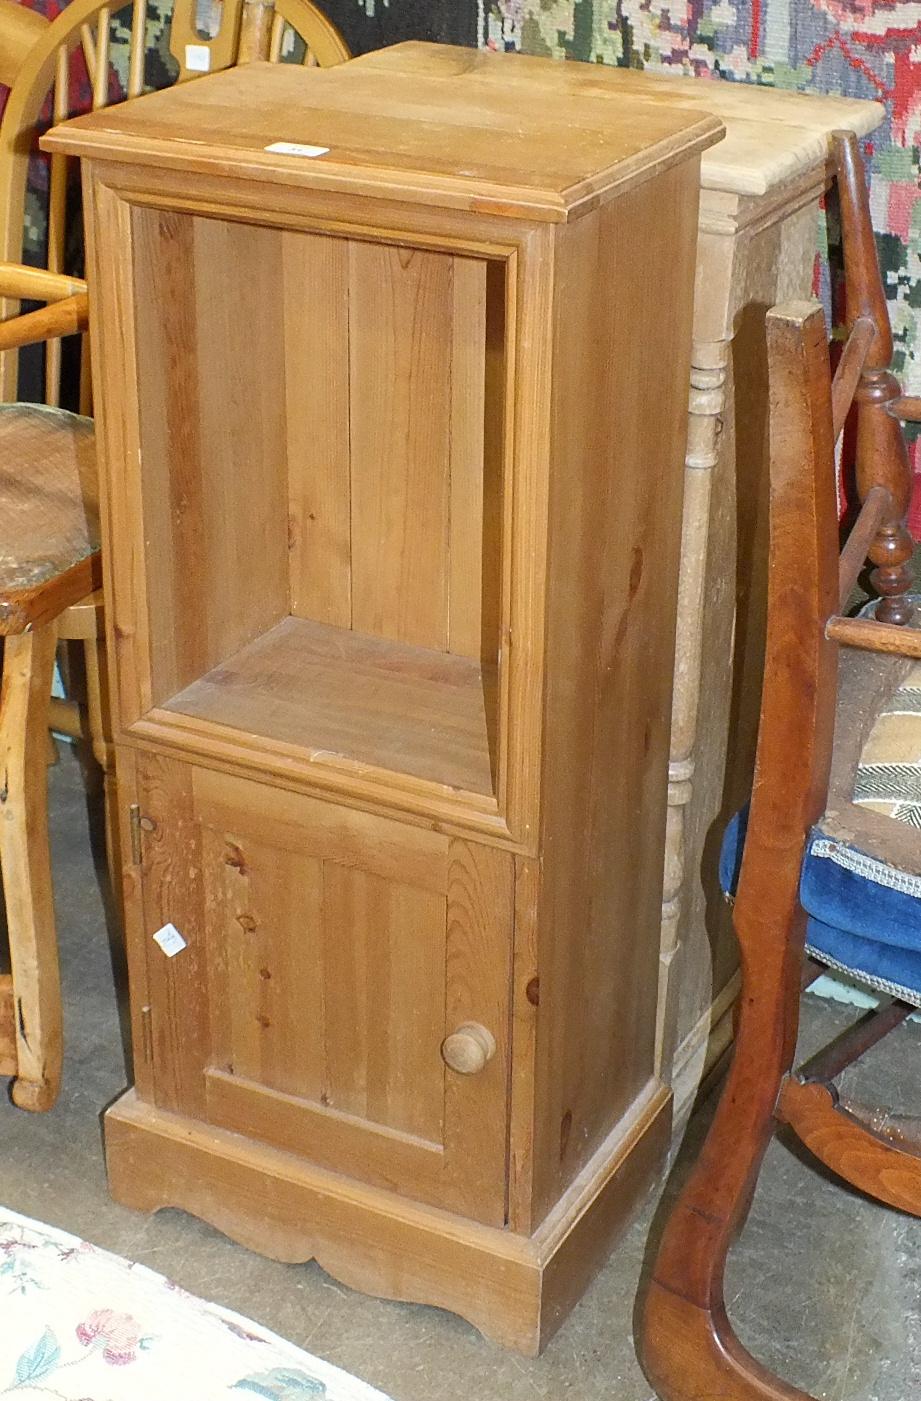 Lot 31 - A stripped pine narrow three-tier bookshelf, 43cm wide, 85.5cm high and a modern pine bedside